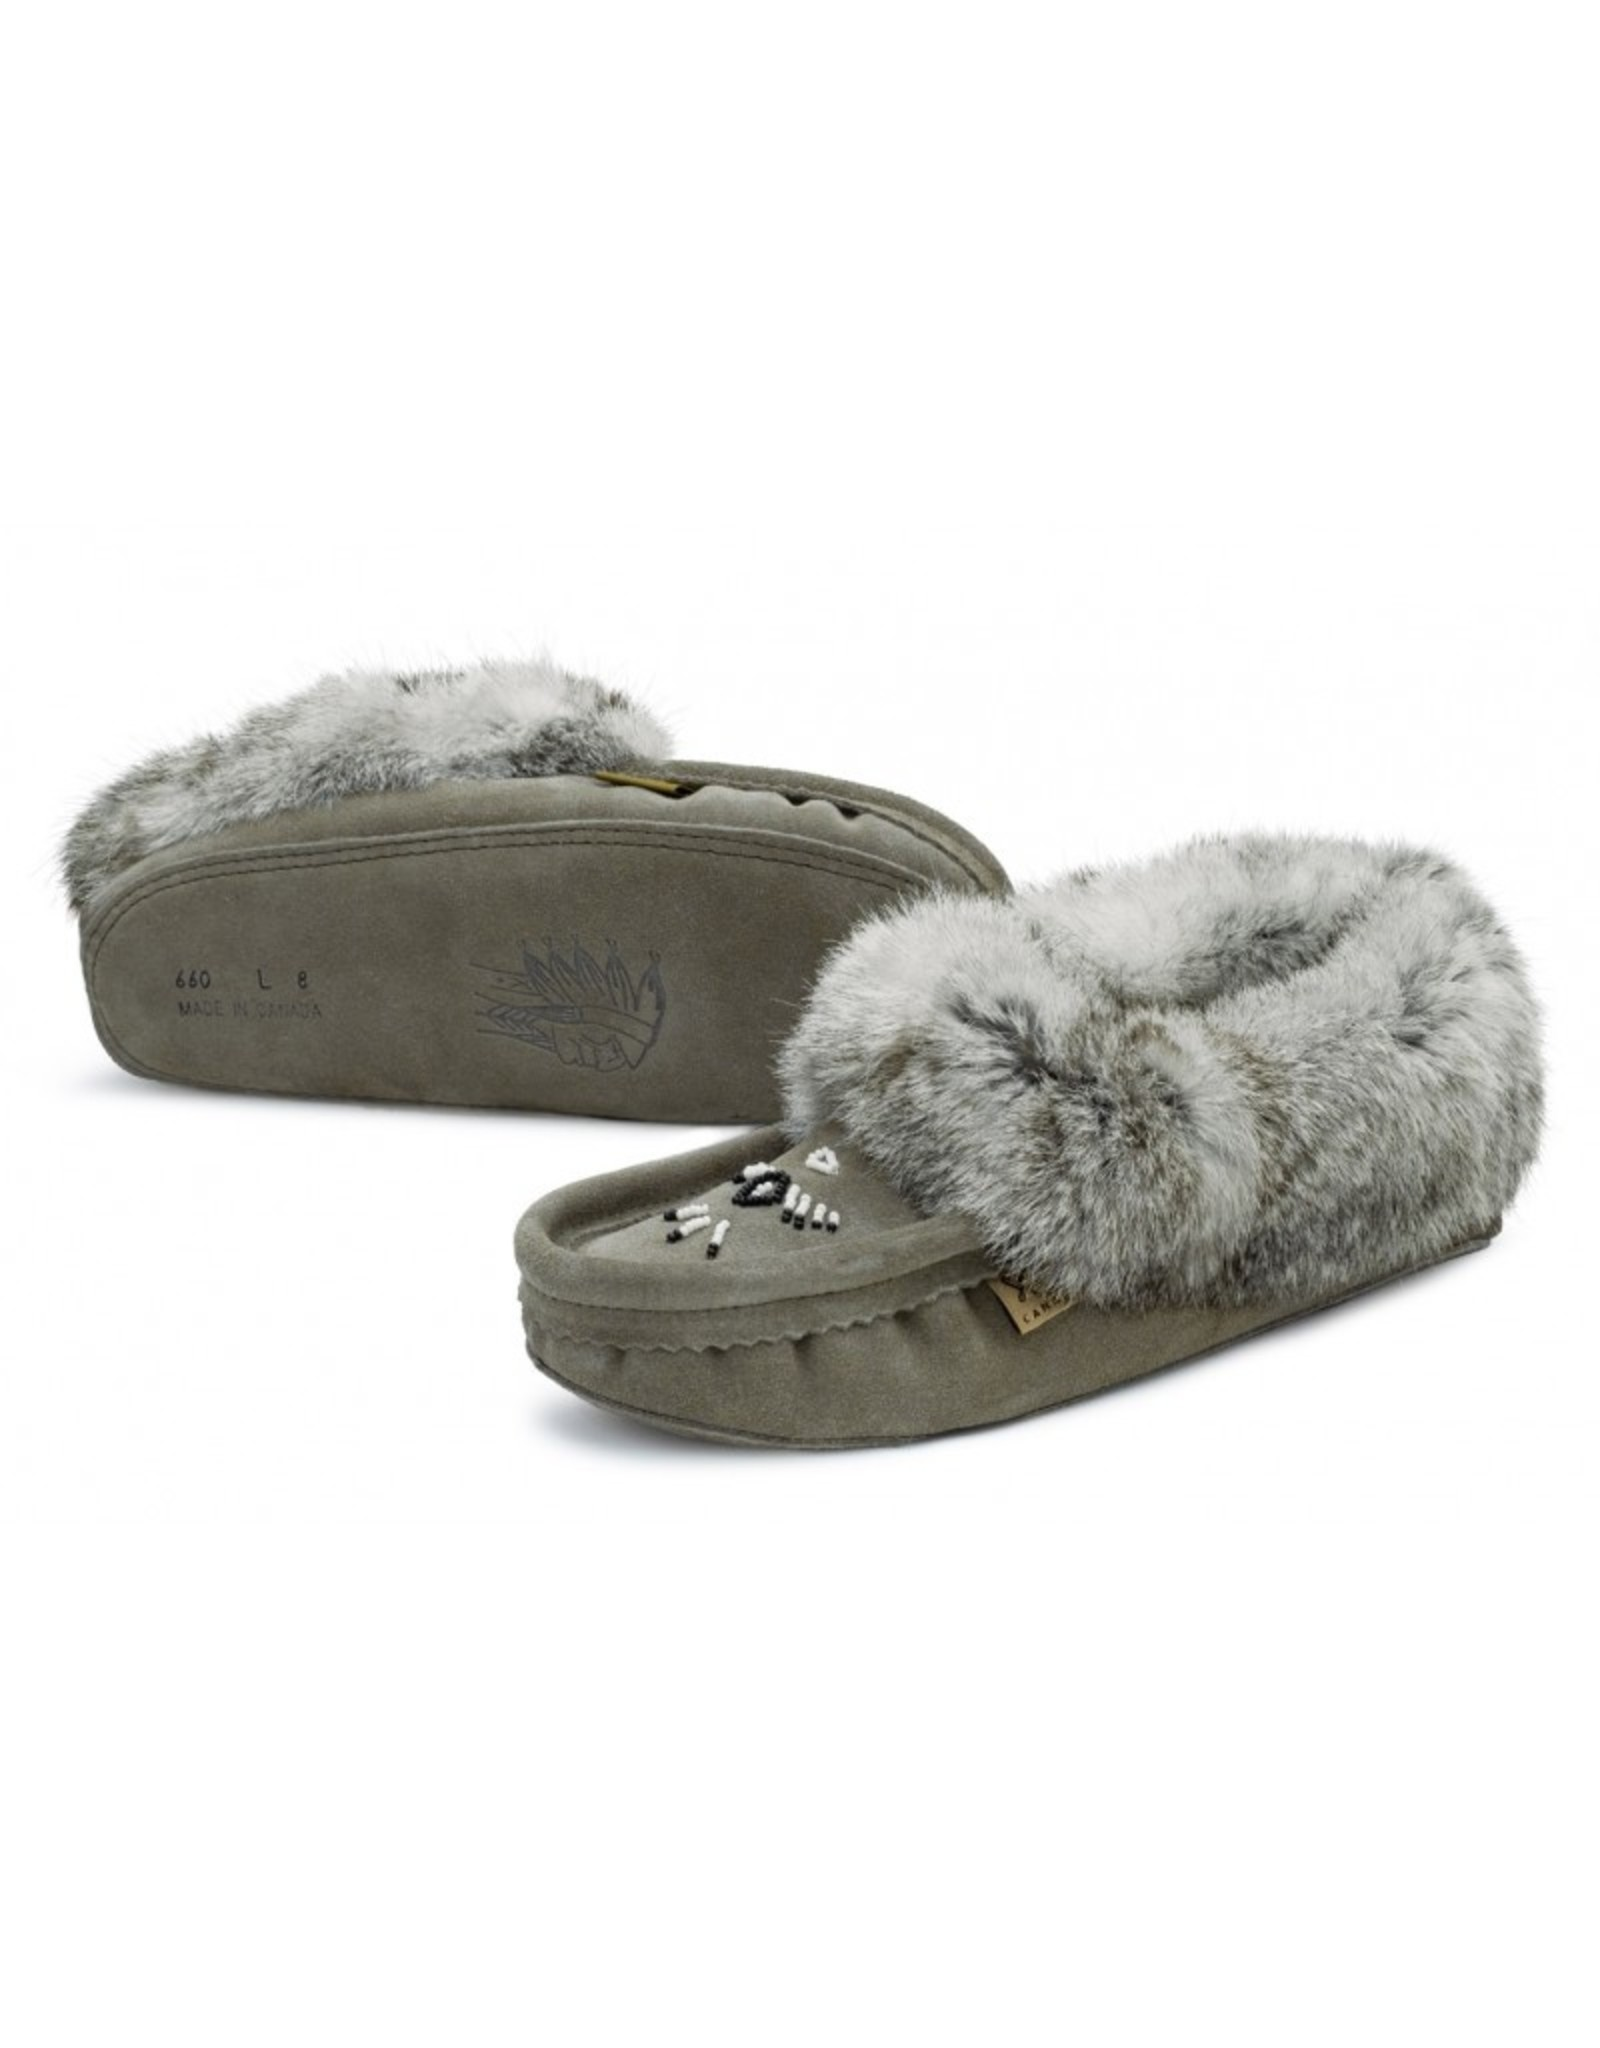 Charcoal Suede Fur Slipper Moccasin - 660L